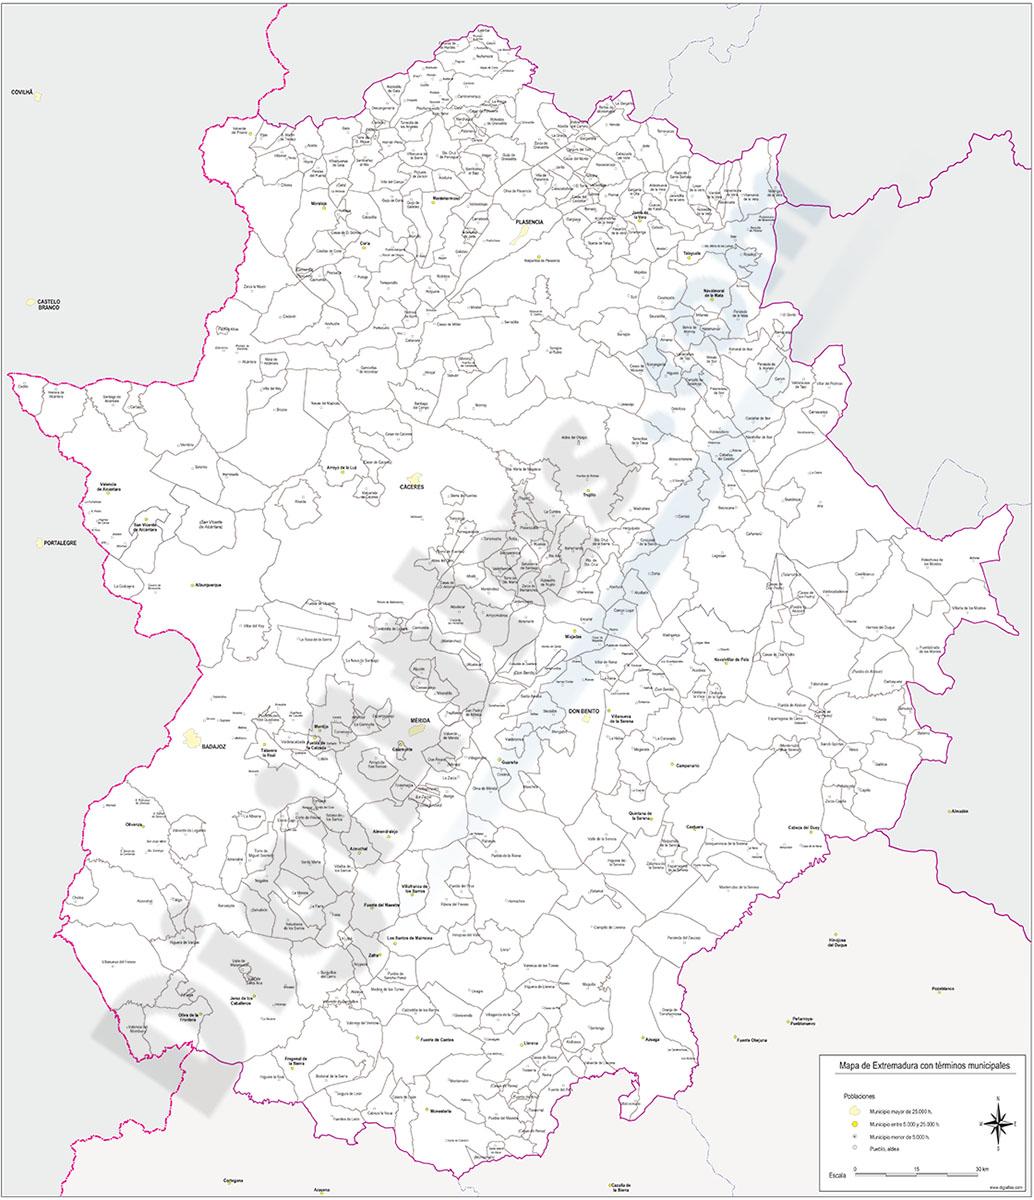 Map of Extremadura Autonomous Community with municipalities